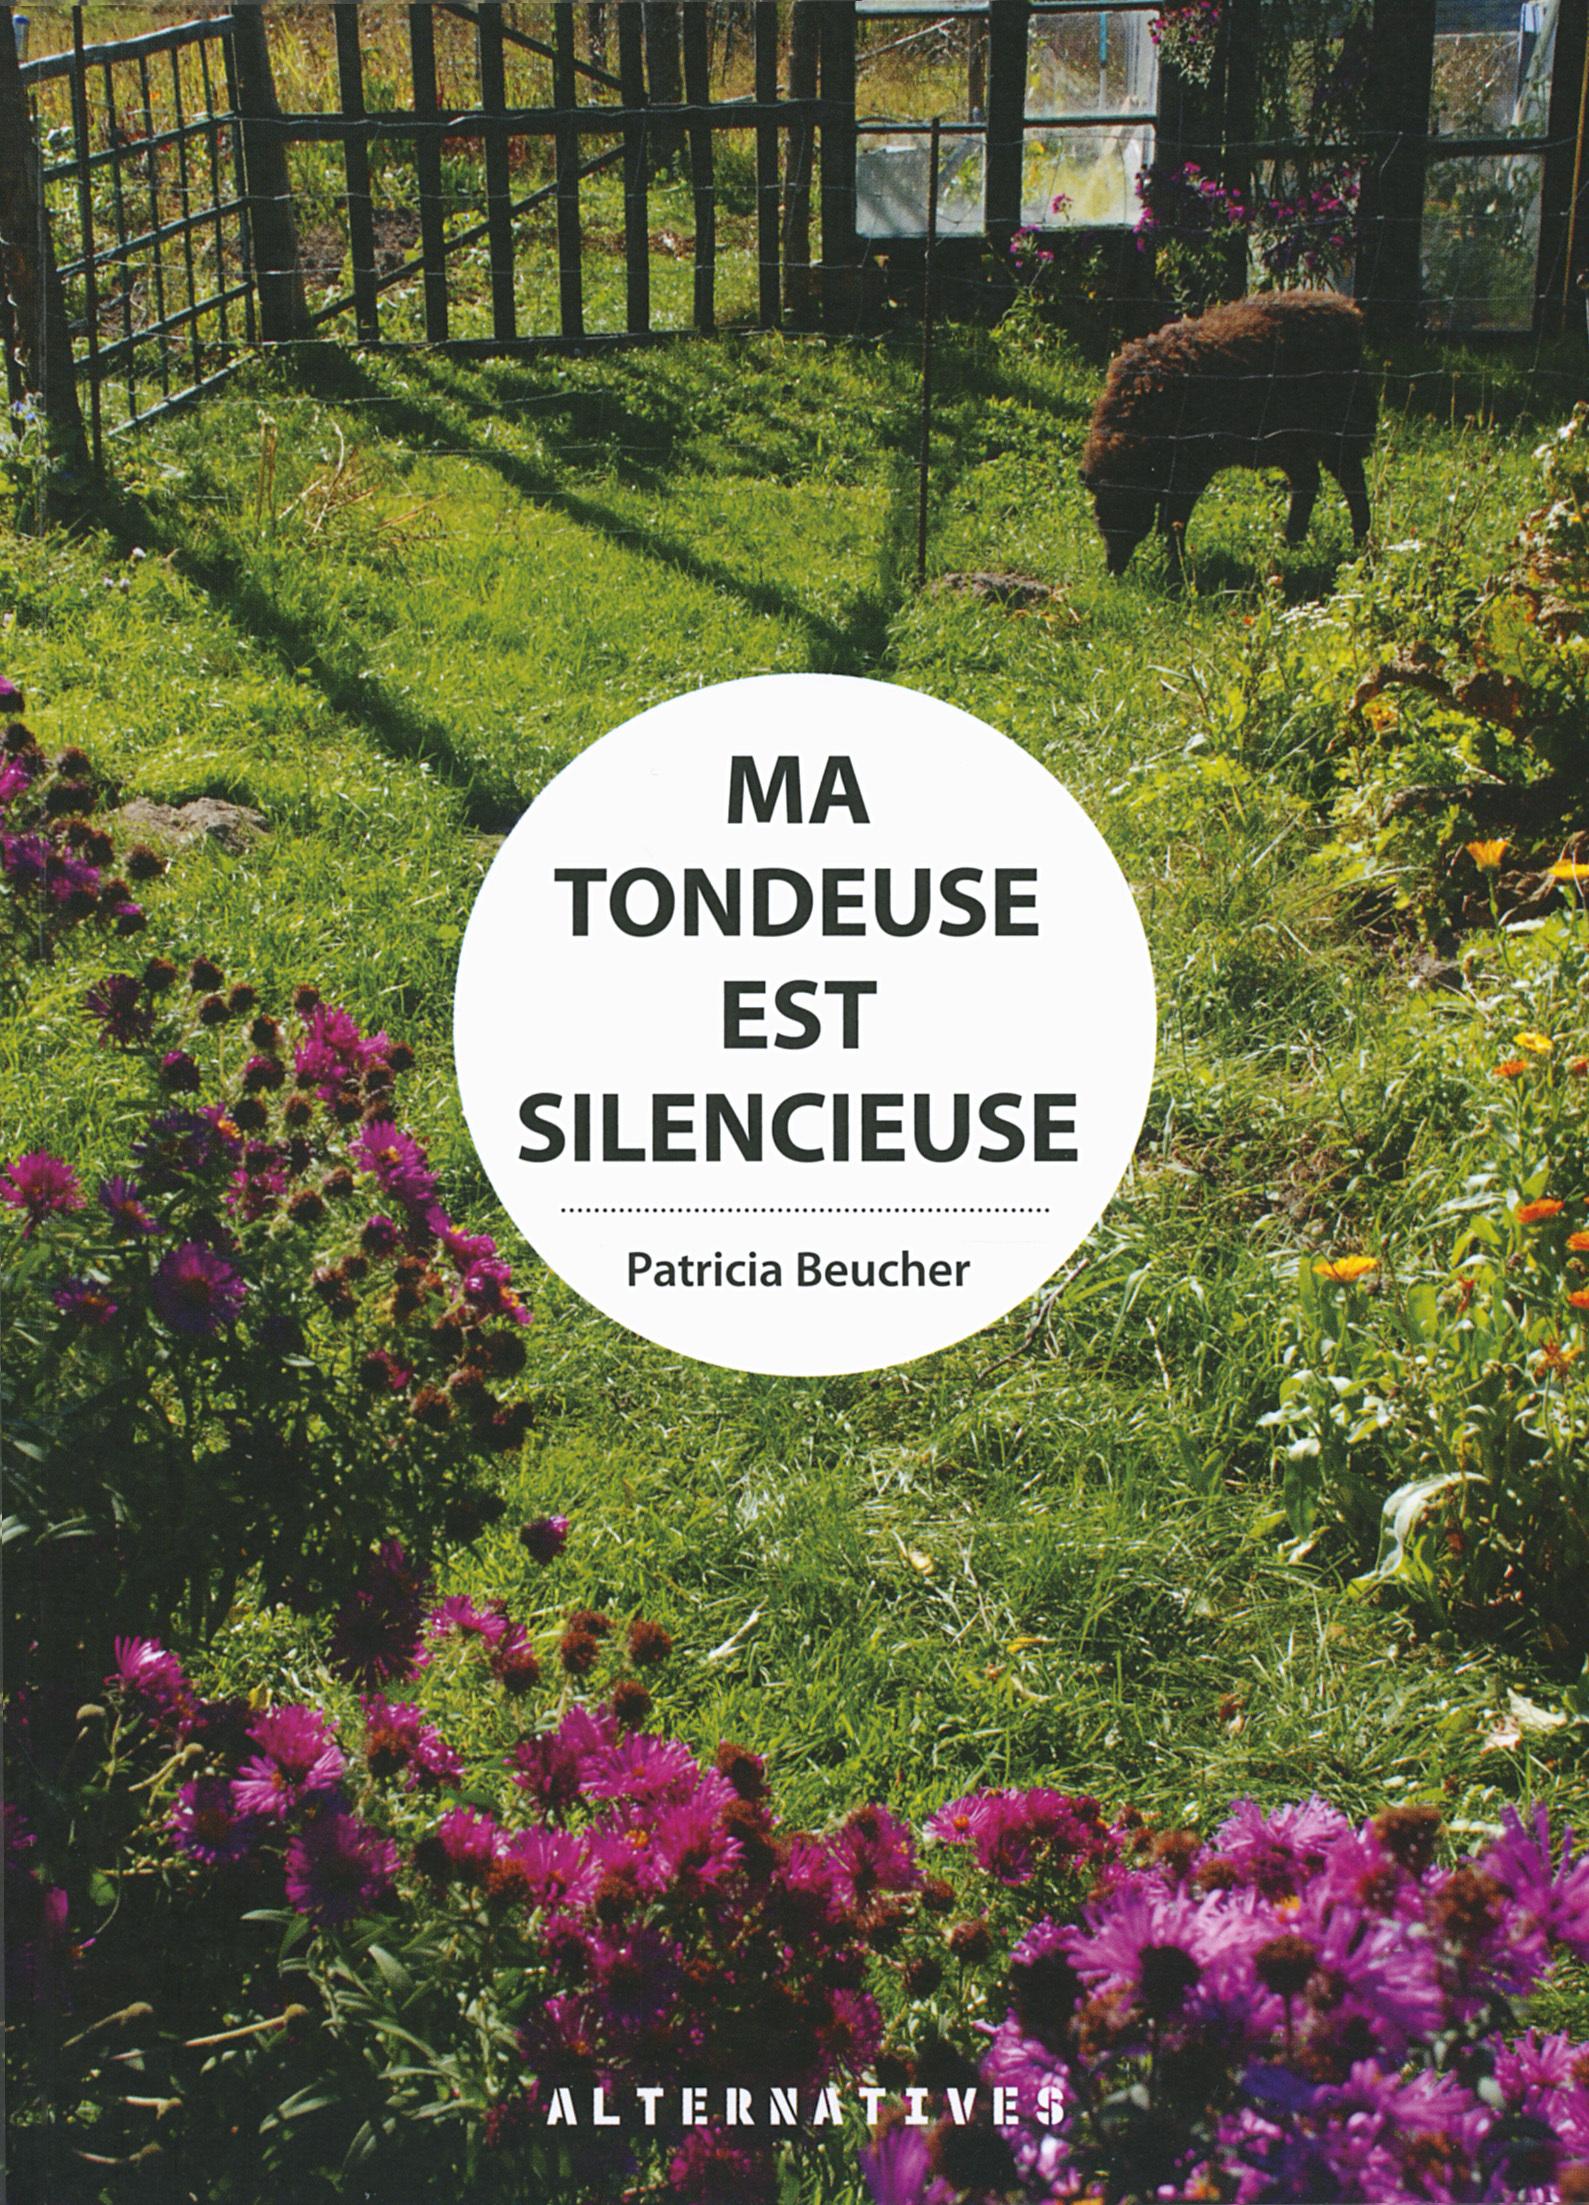 MA TONDEUSE EST SILENCIEUSE